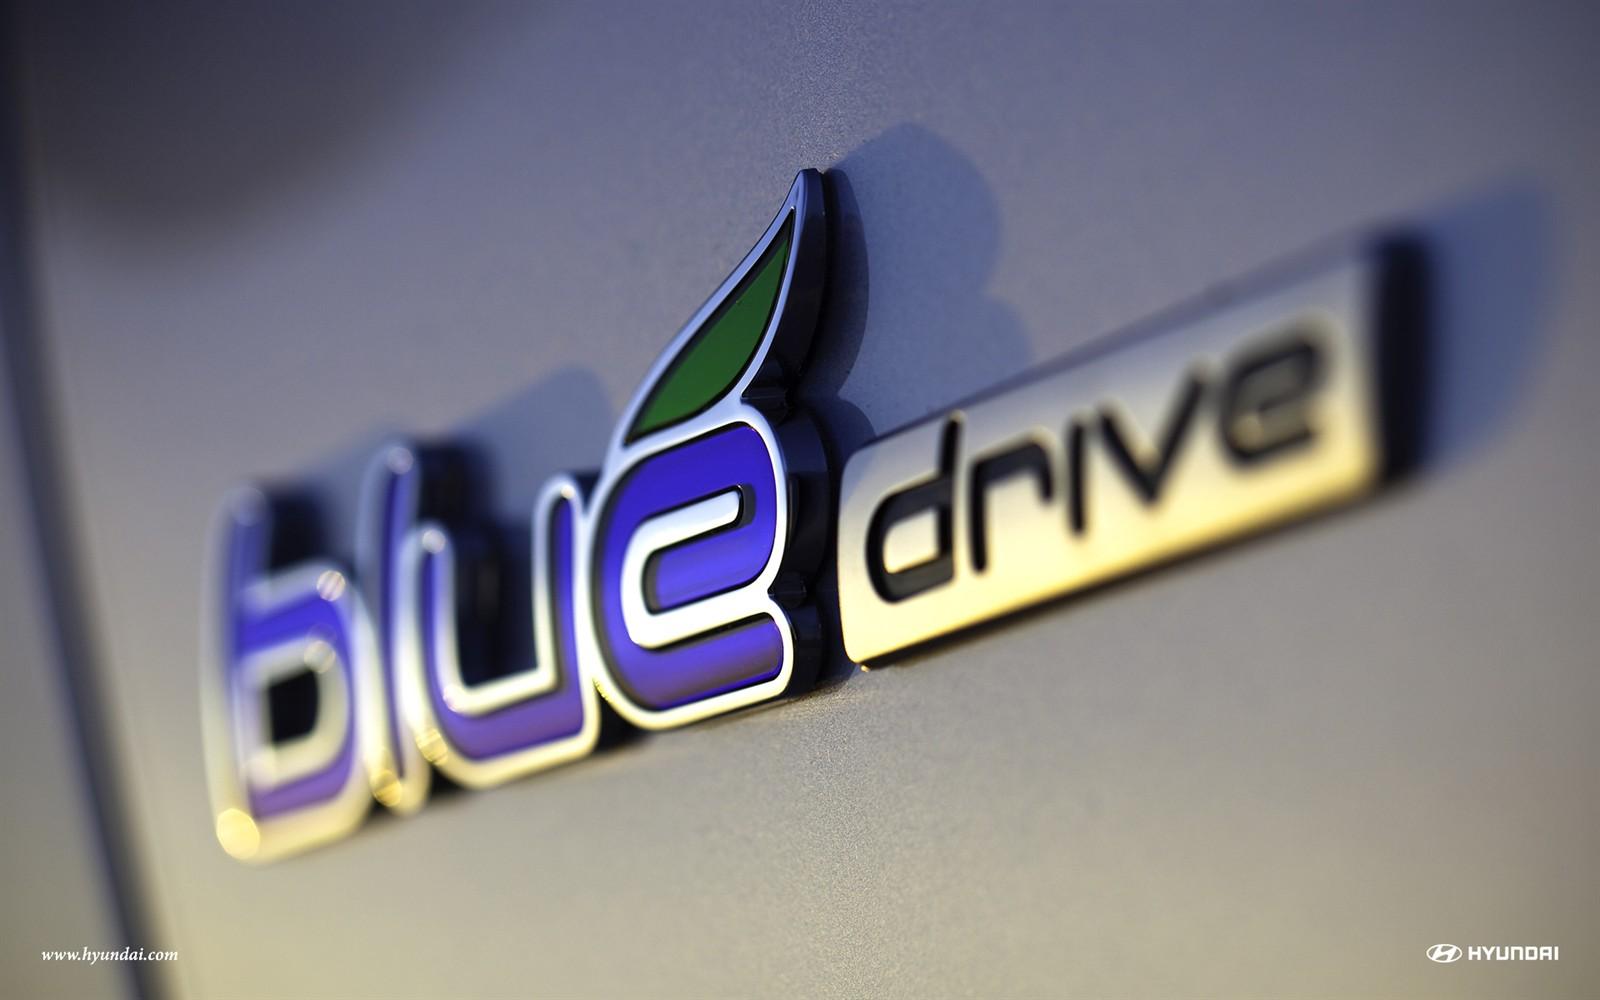 Hyundai & Kia To Upgrade Fuel Efficiency by 25% by 2020, Chung Mong-Koo Said